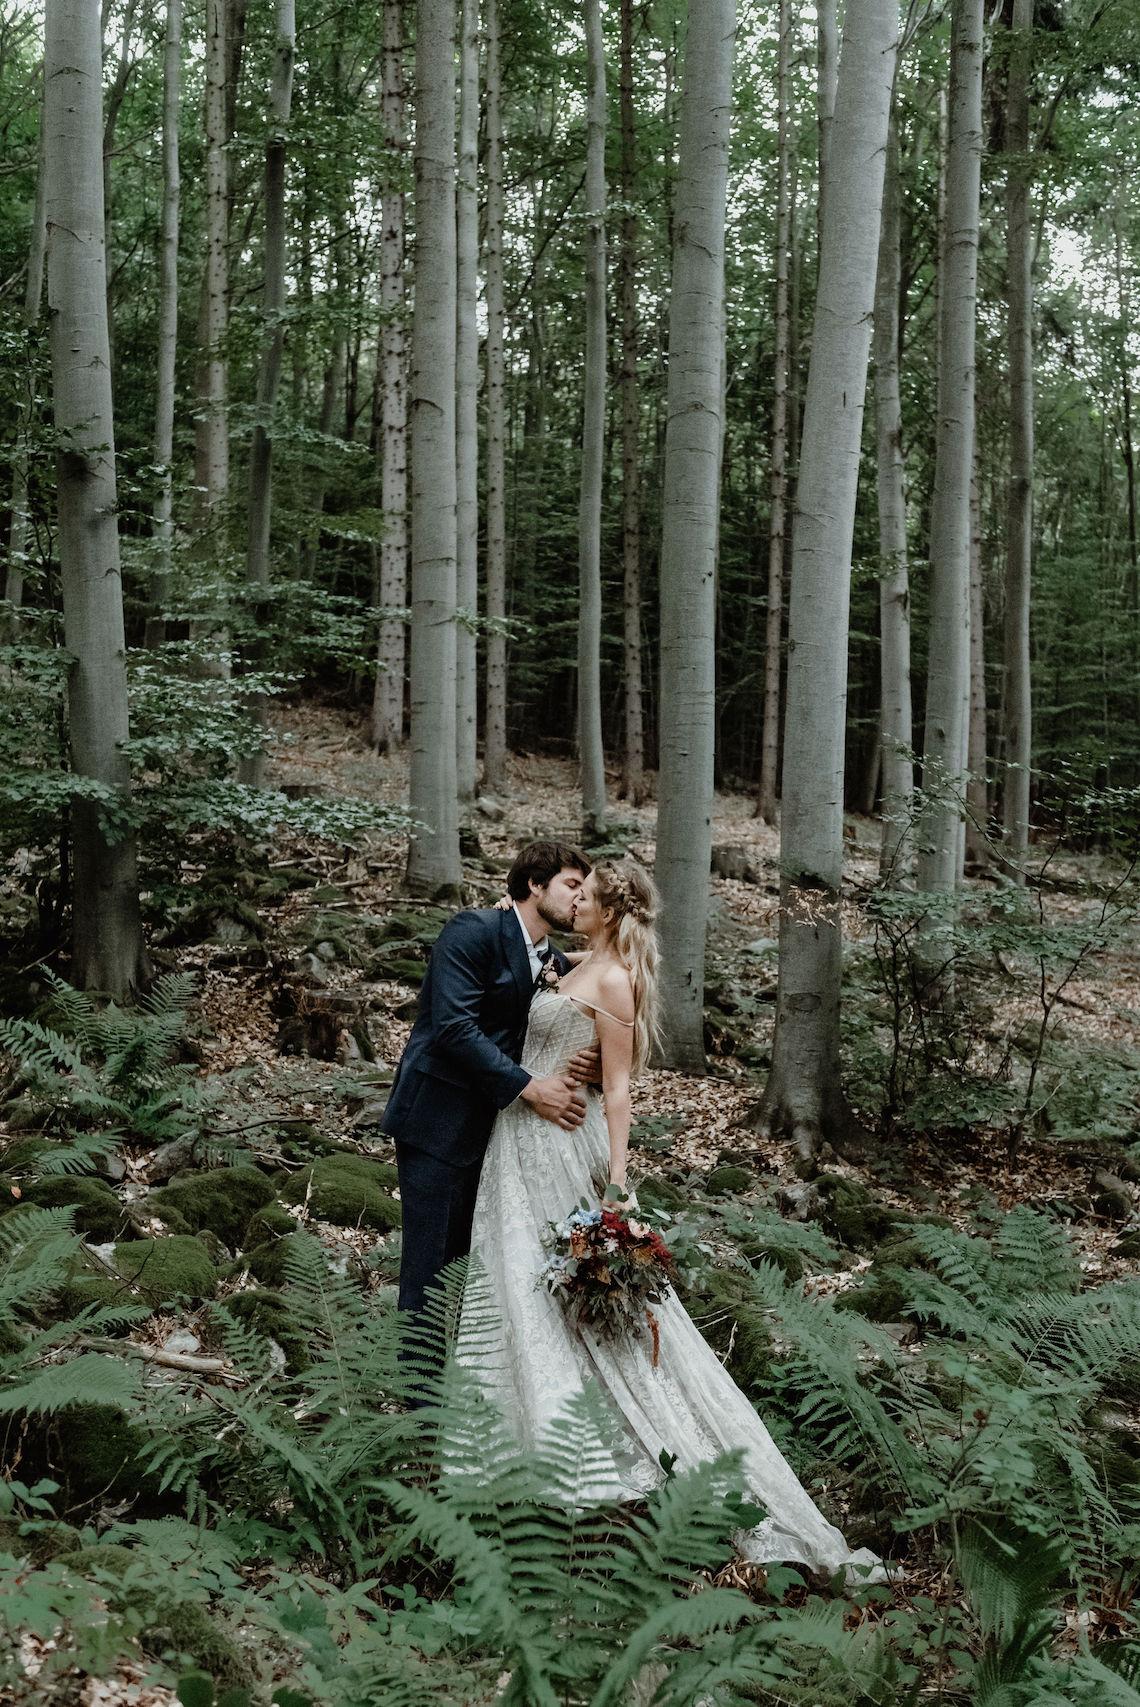 Romantic Woodsy DIY Wedding in South Bohemia Czech Republic – Carols Darkroom 24